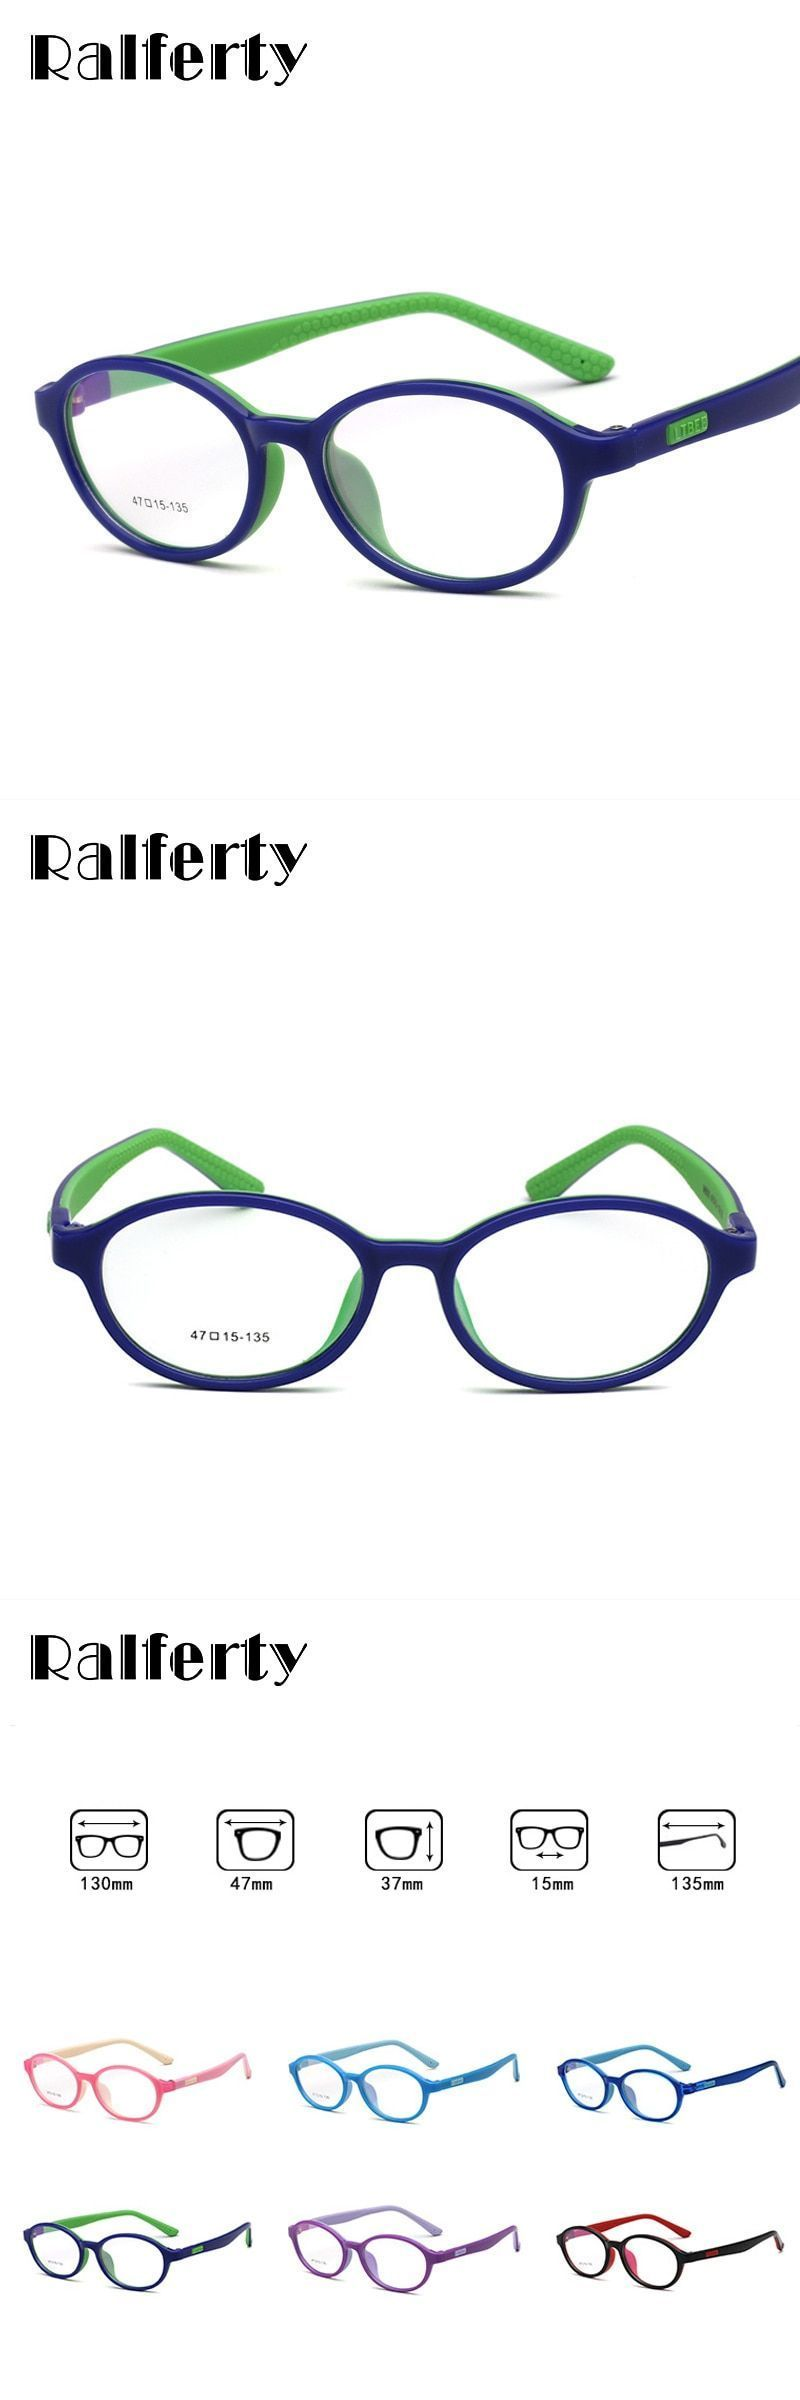 5df0858079 Child ultra-light glasses frame flexible tr90 silicone kids eyewear frames  prescription glasses boy girl